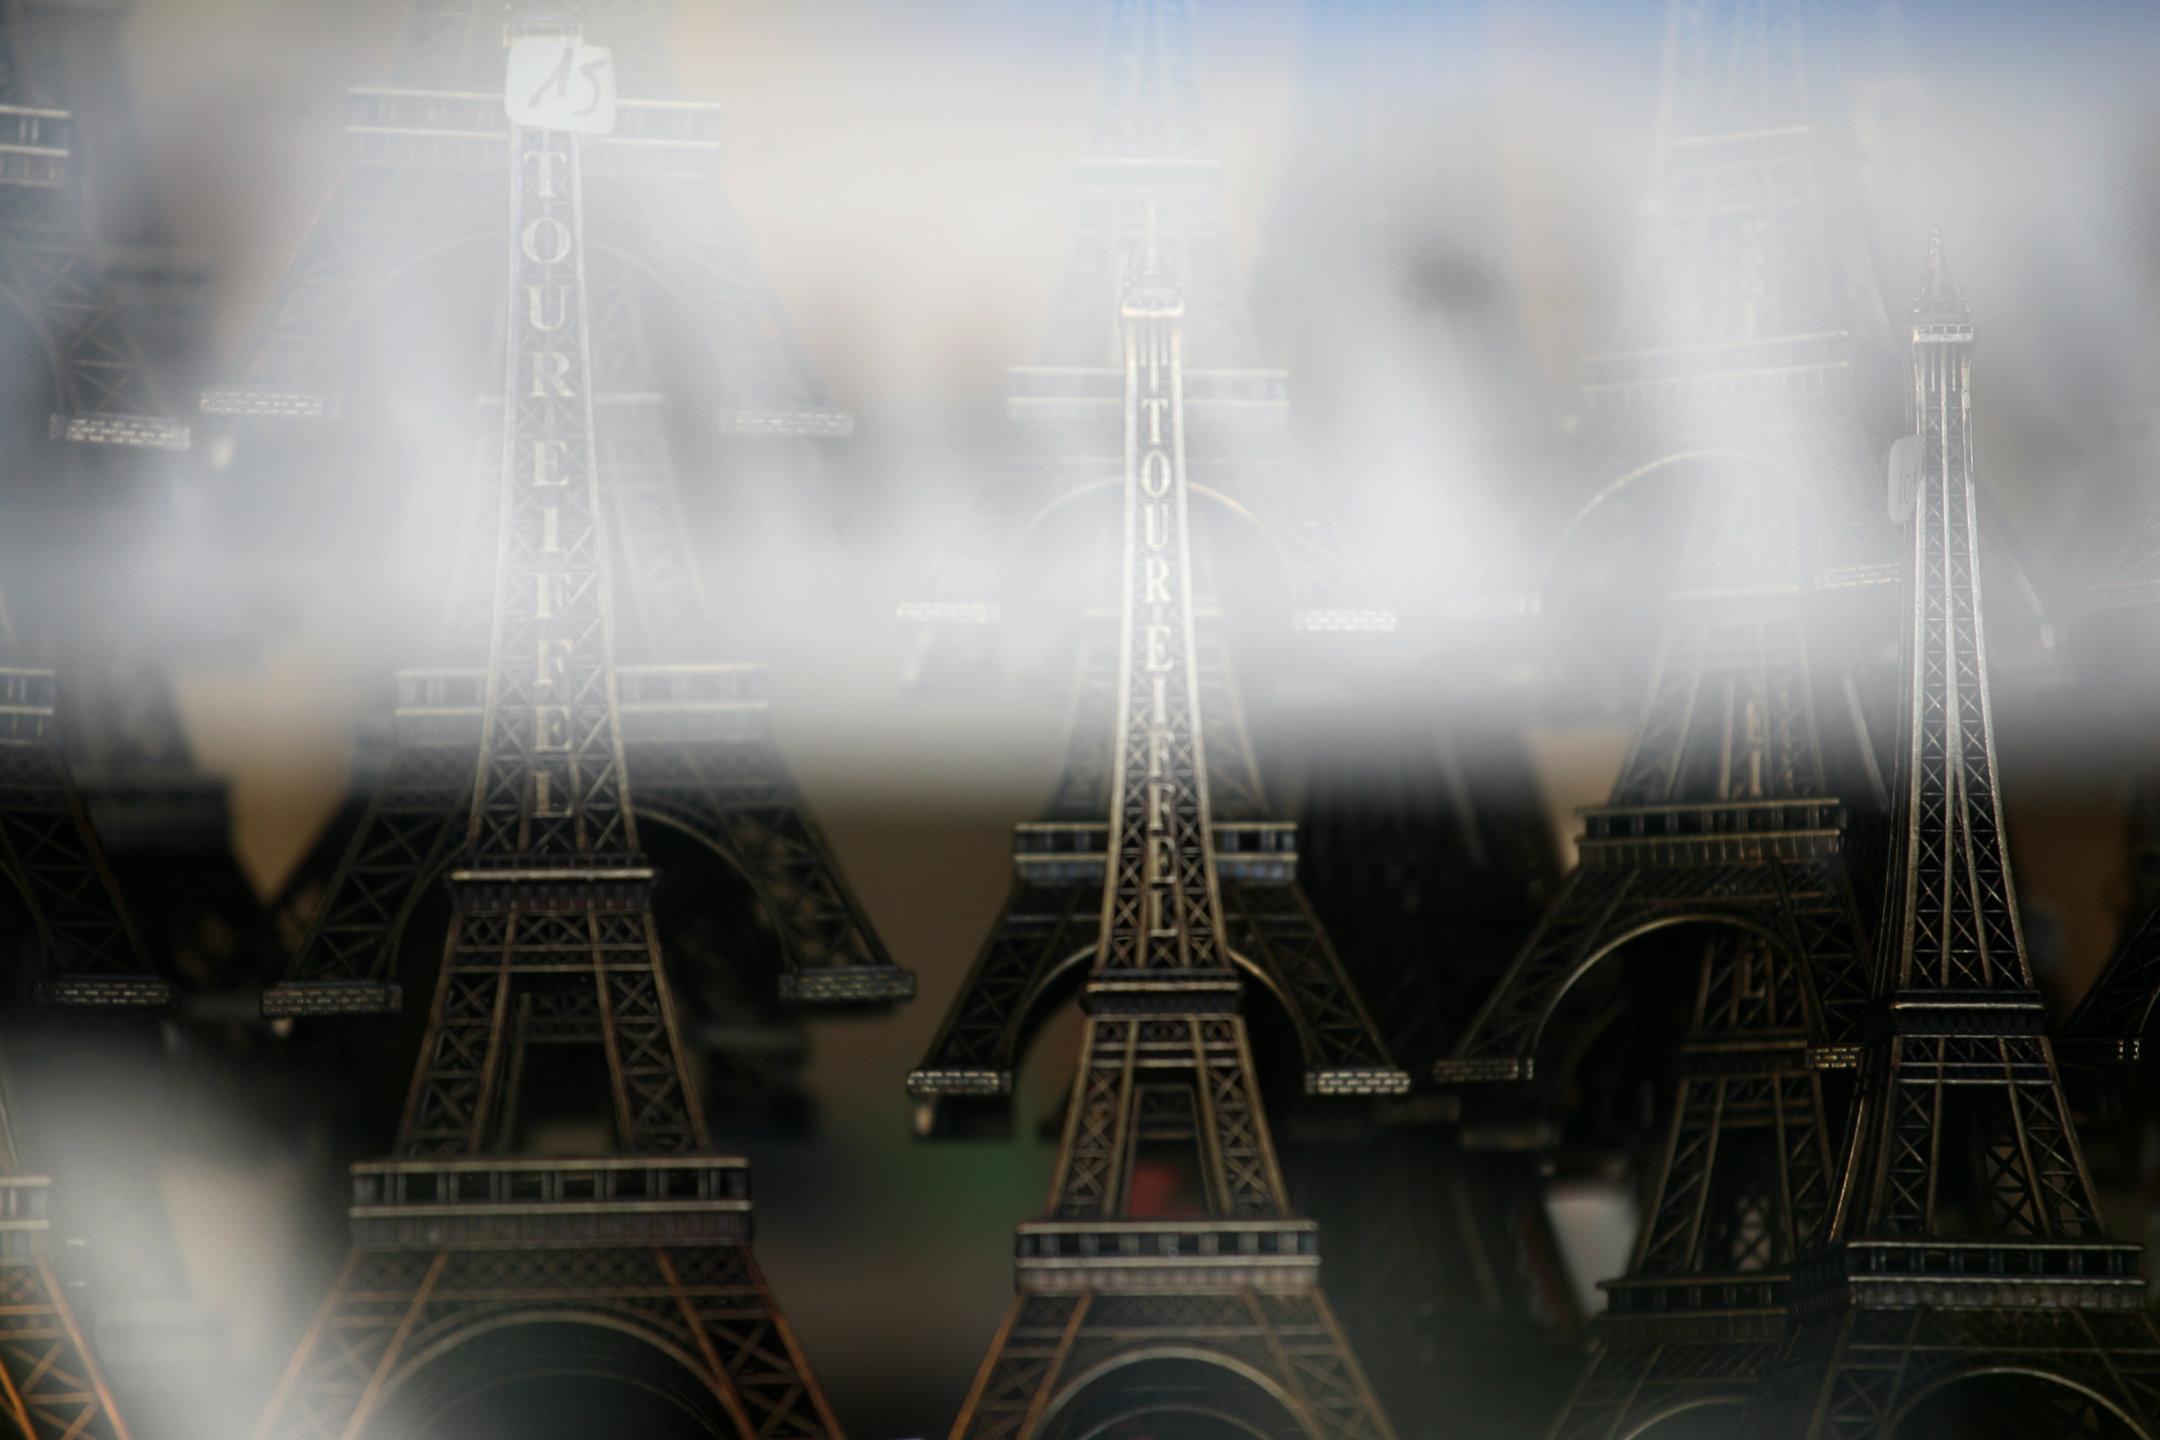 Torre_3.jpg